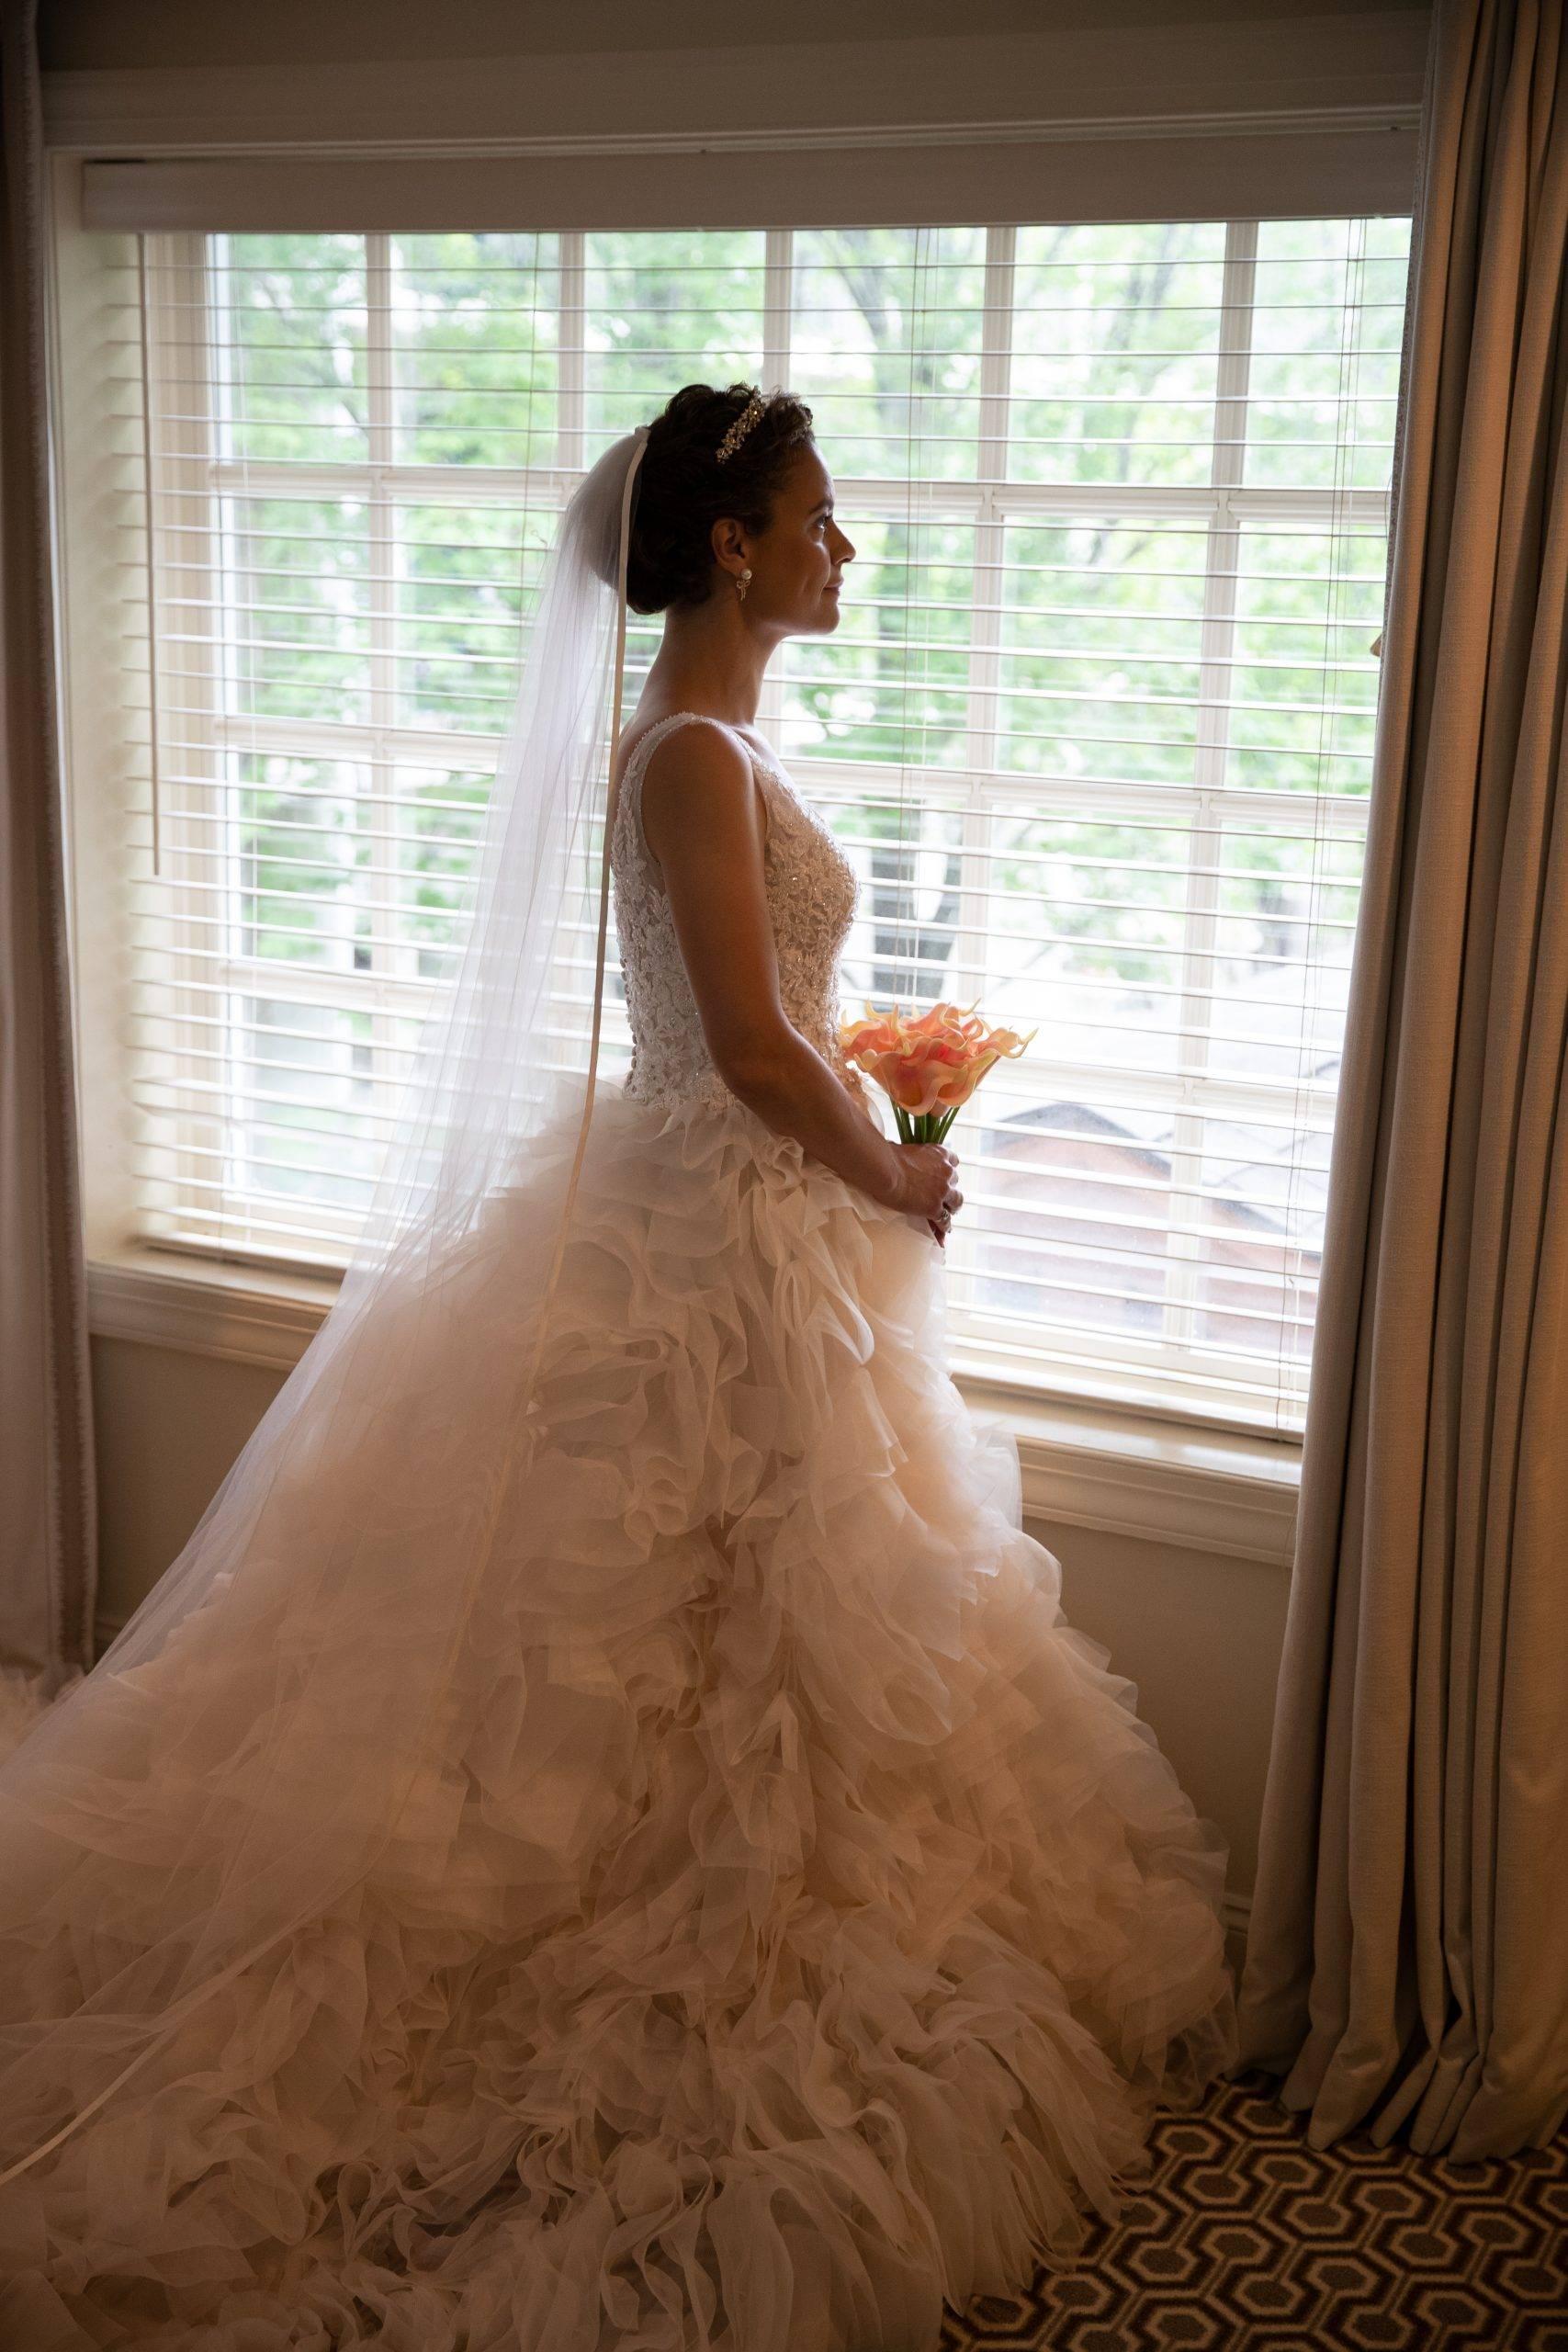 Olde Mill Inn bride ready for her wedding